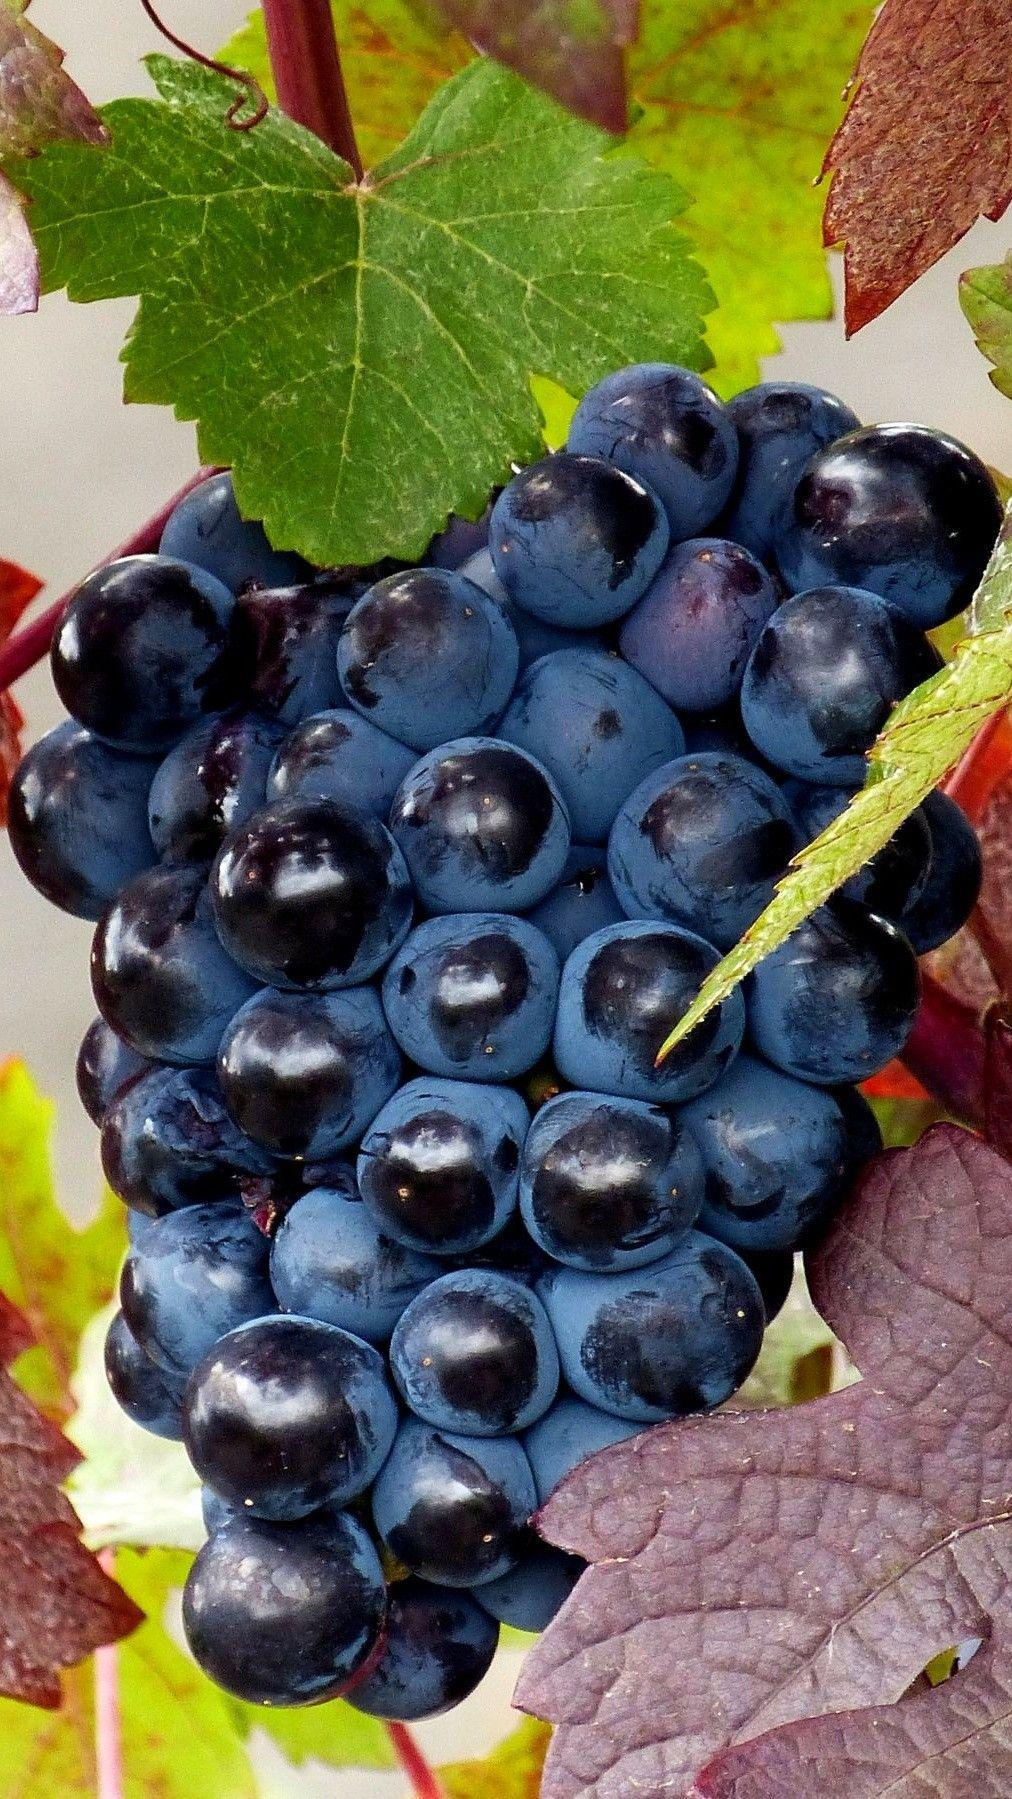 Abundance of Fruits Wallpaper Border Grape Fig Tuscan Country Kitchen Wall Decor